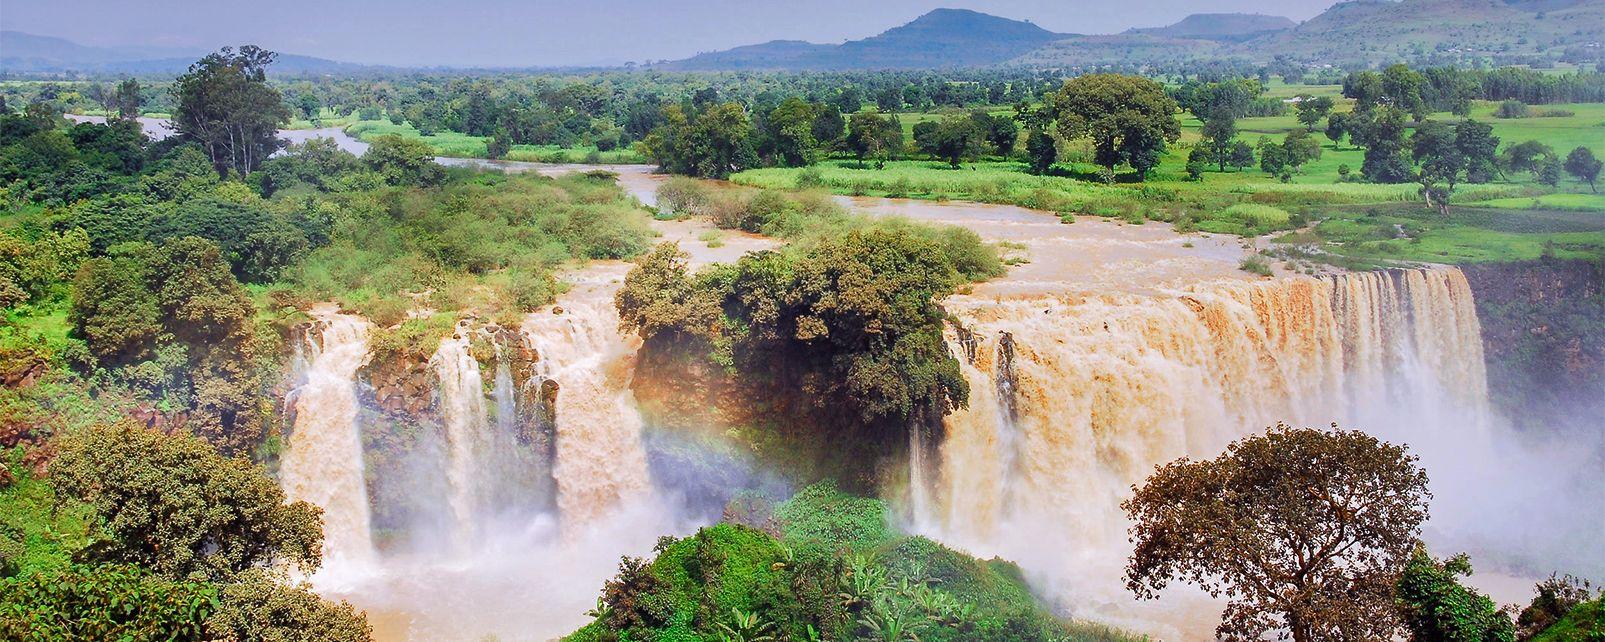 Les chutes du Nil Bleu , Ethiopie